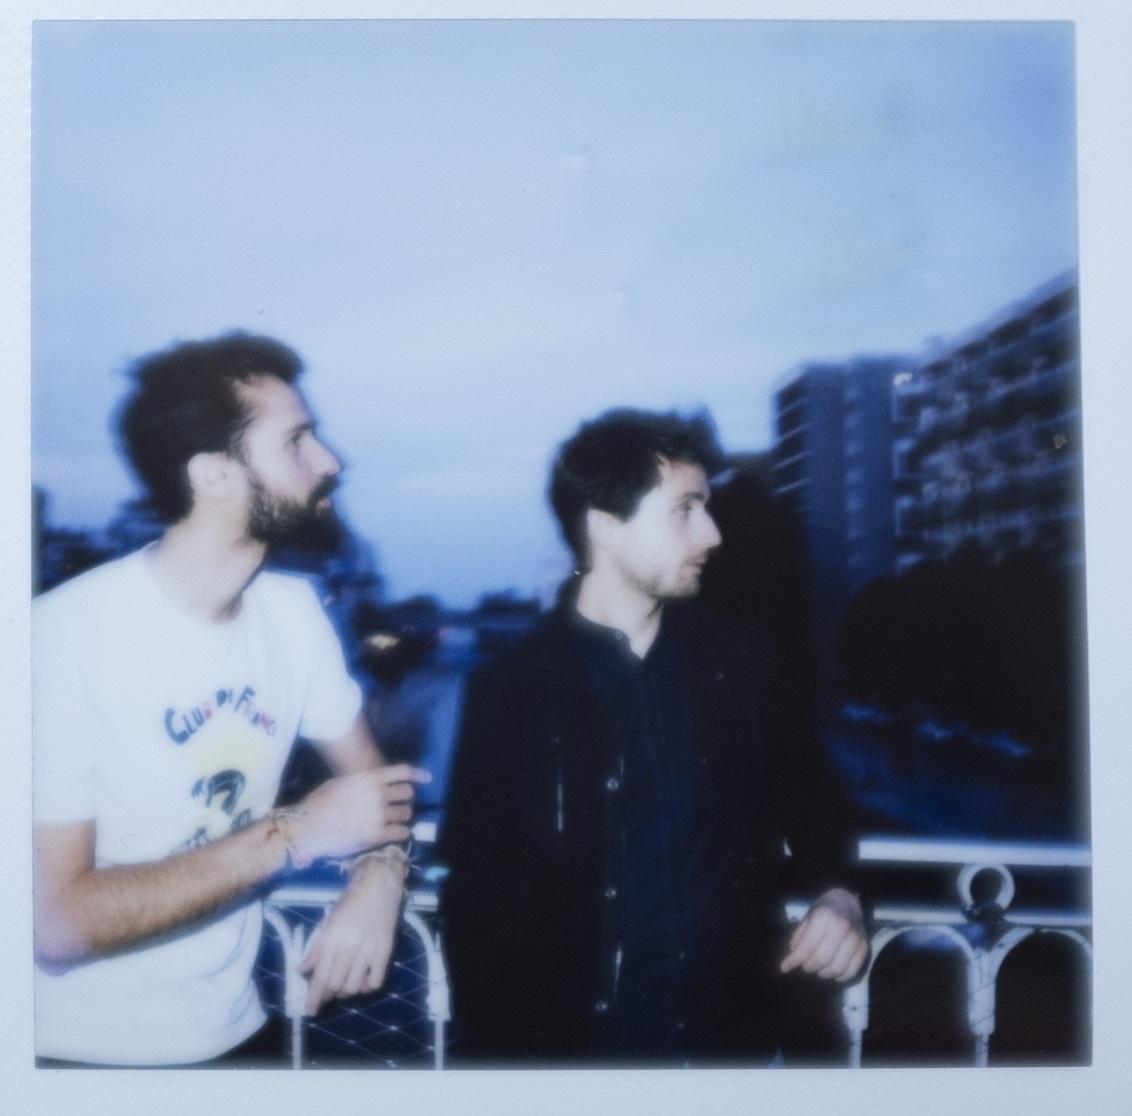 Antoine et Florian